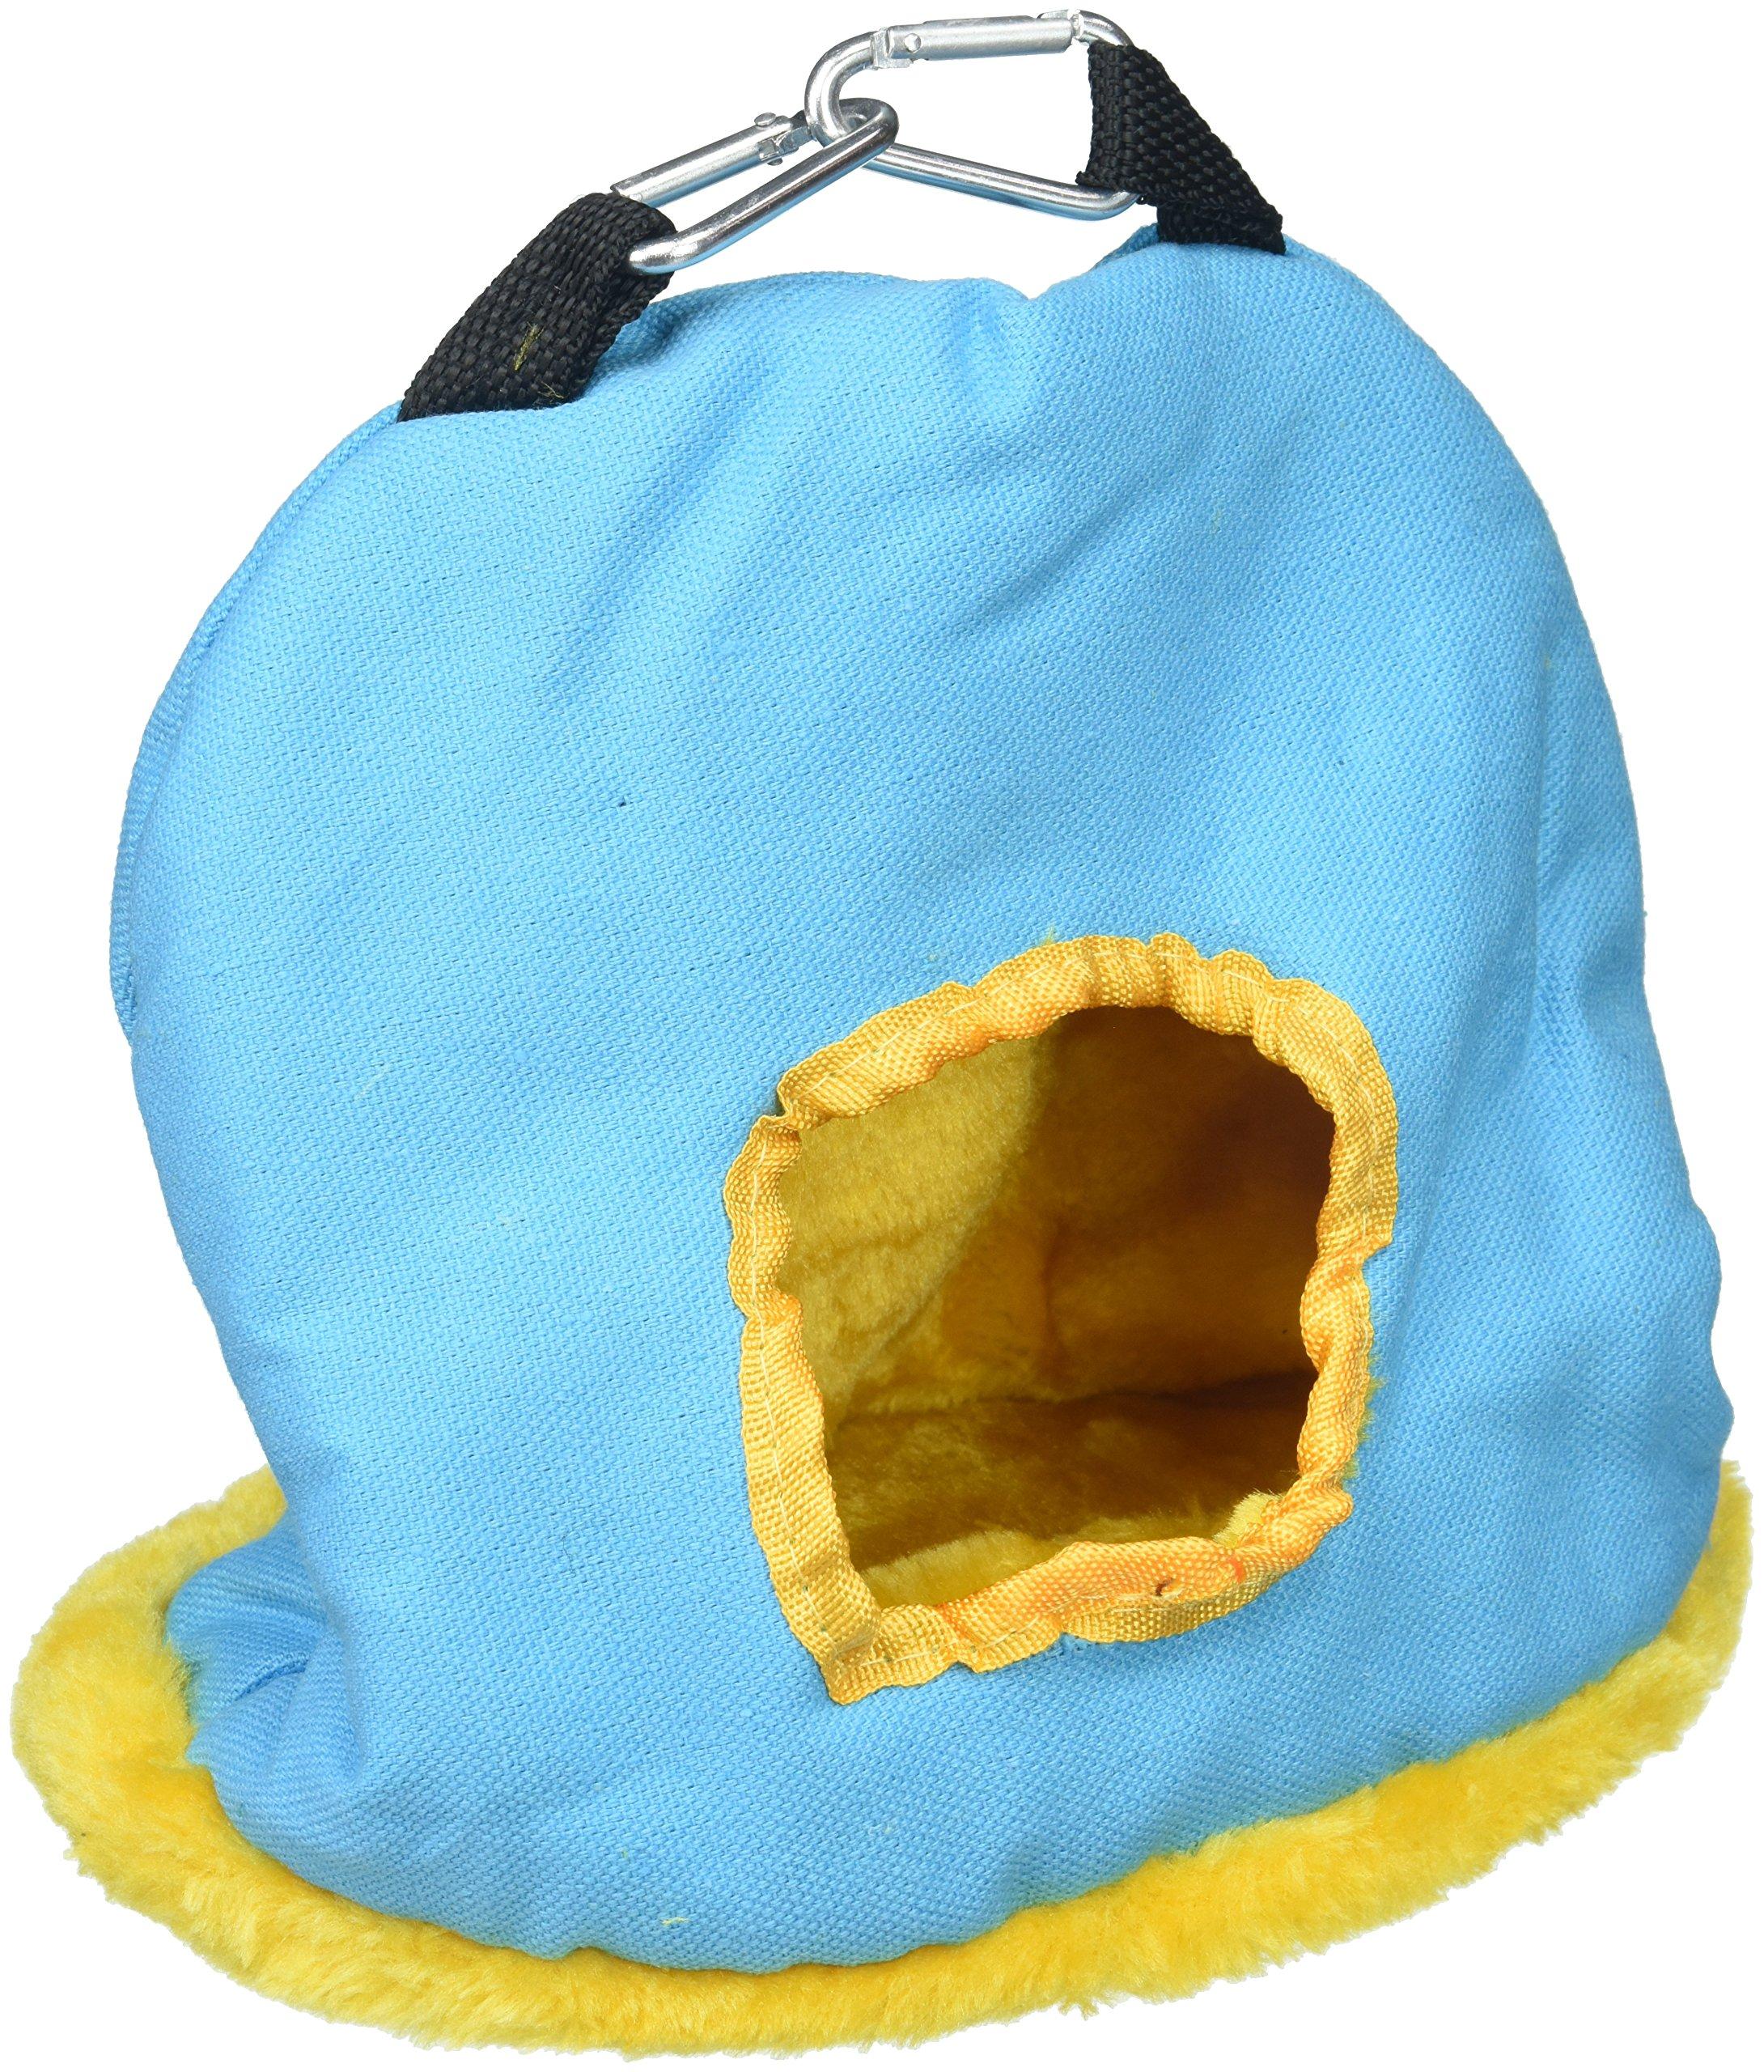 Prevue Pet Products Medium Snuggle Sack Assorted Colors